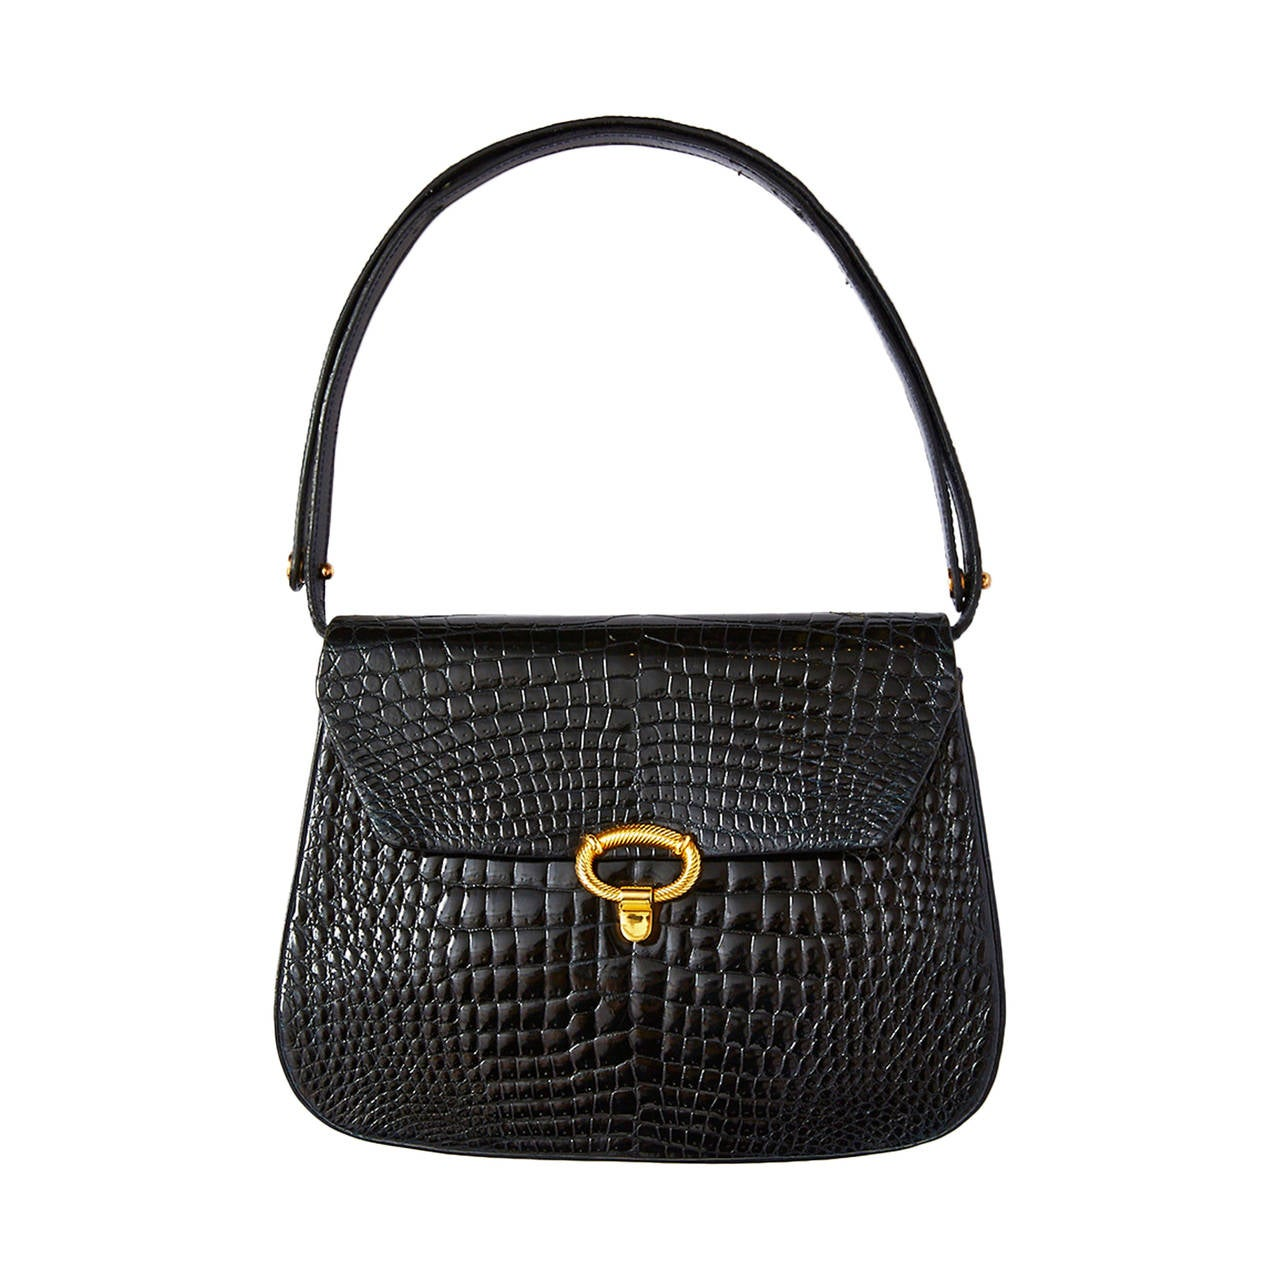 1stdibs Phynes Black Leather Handbag With Attachable Shoulder Straps wPiVZgWx